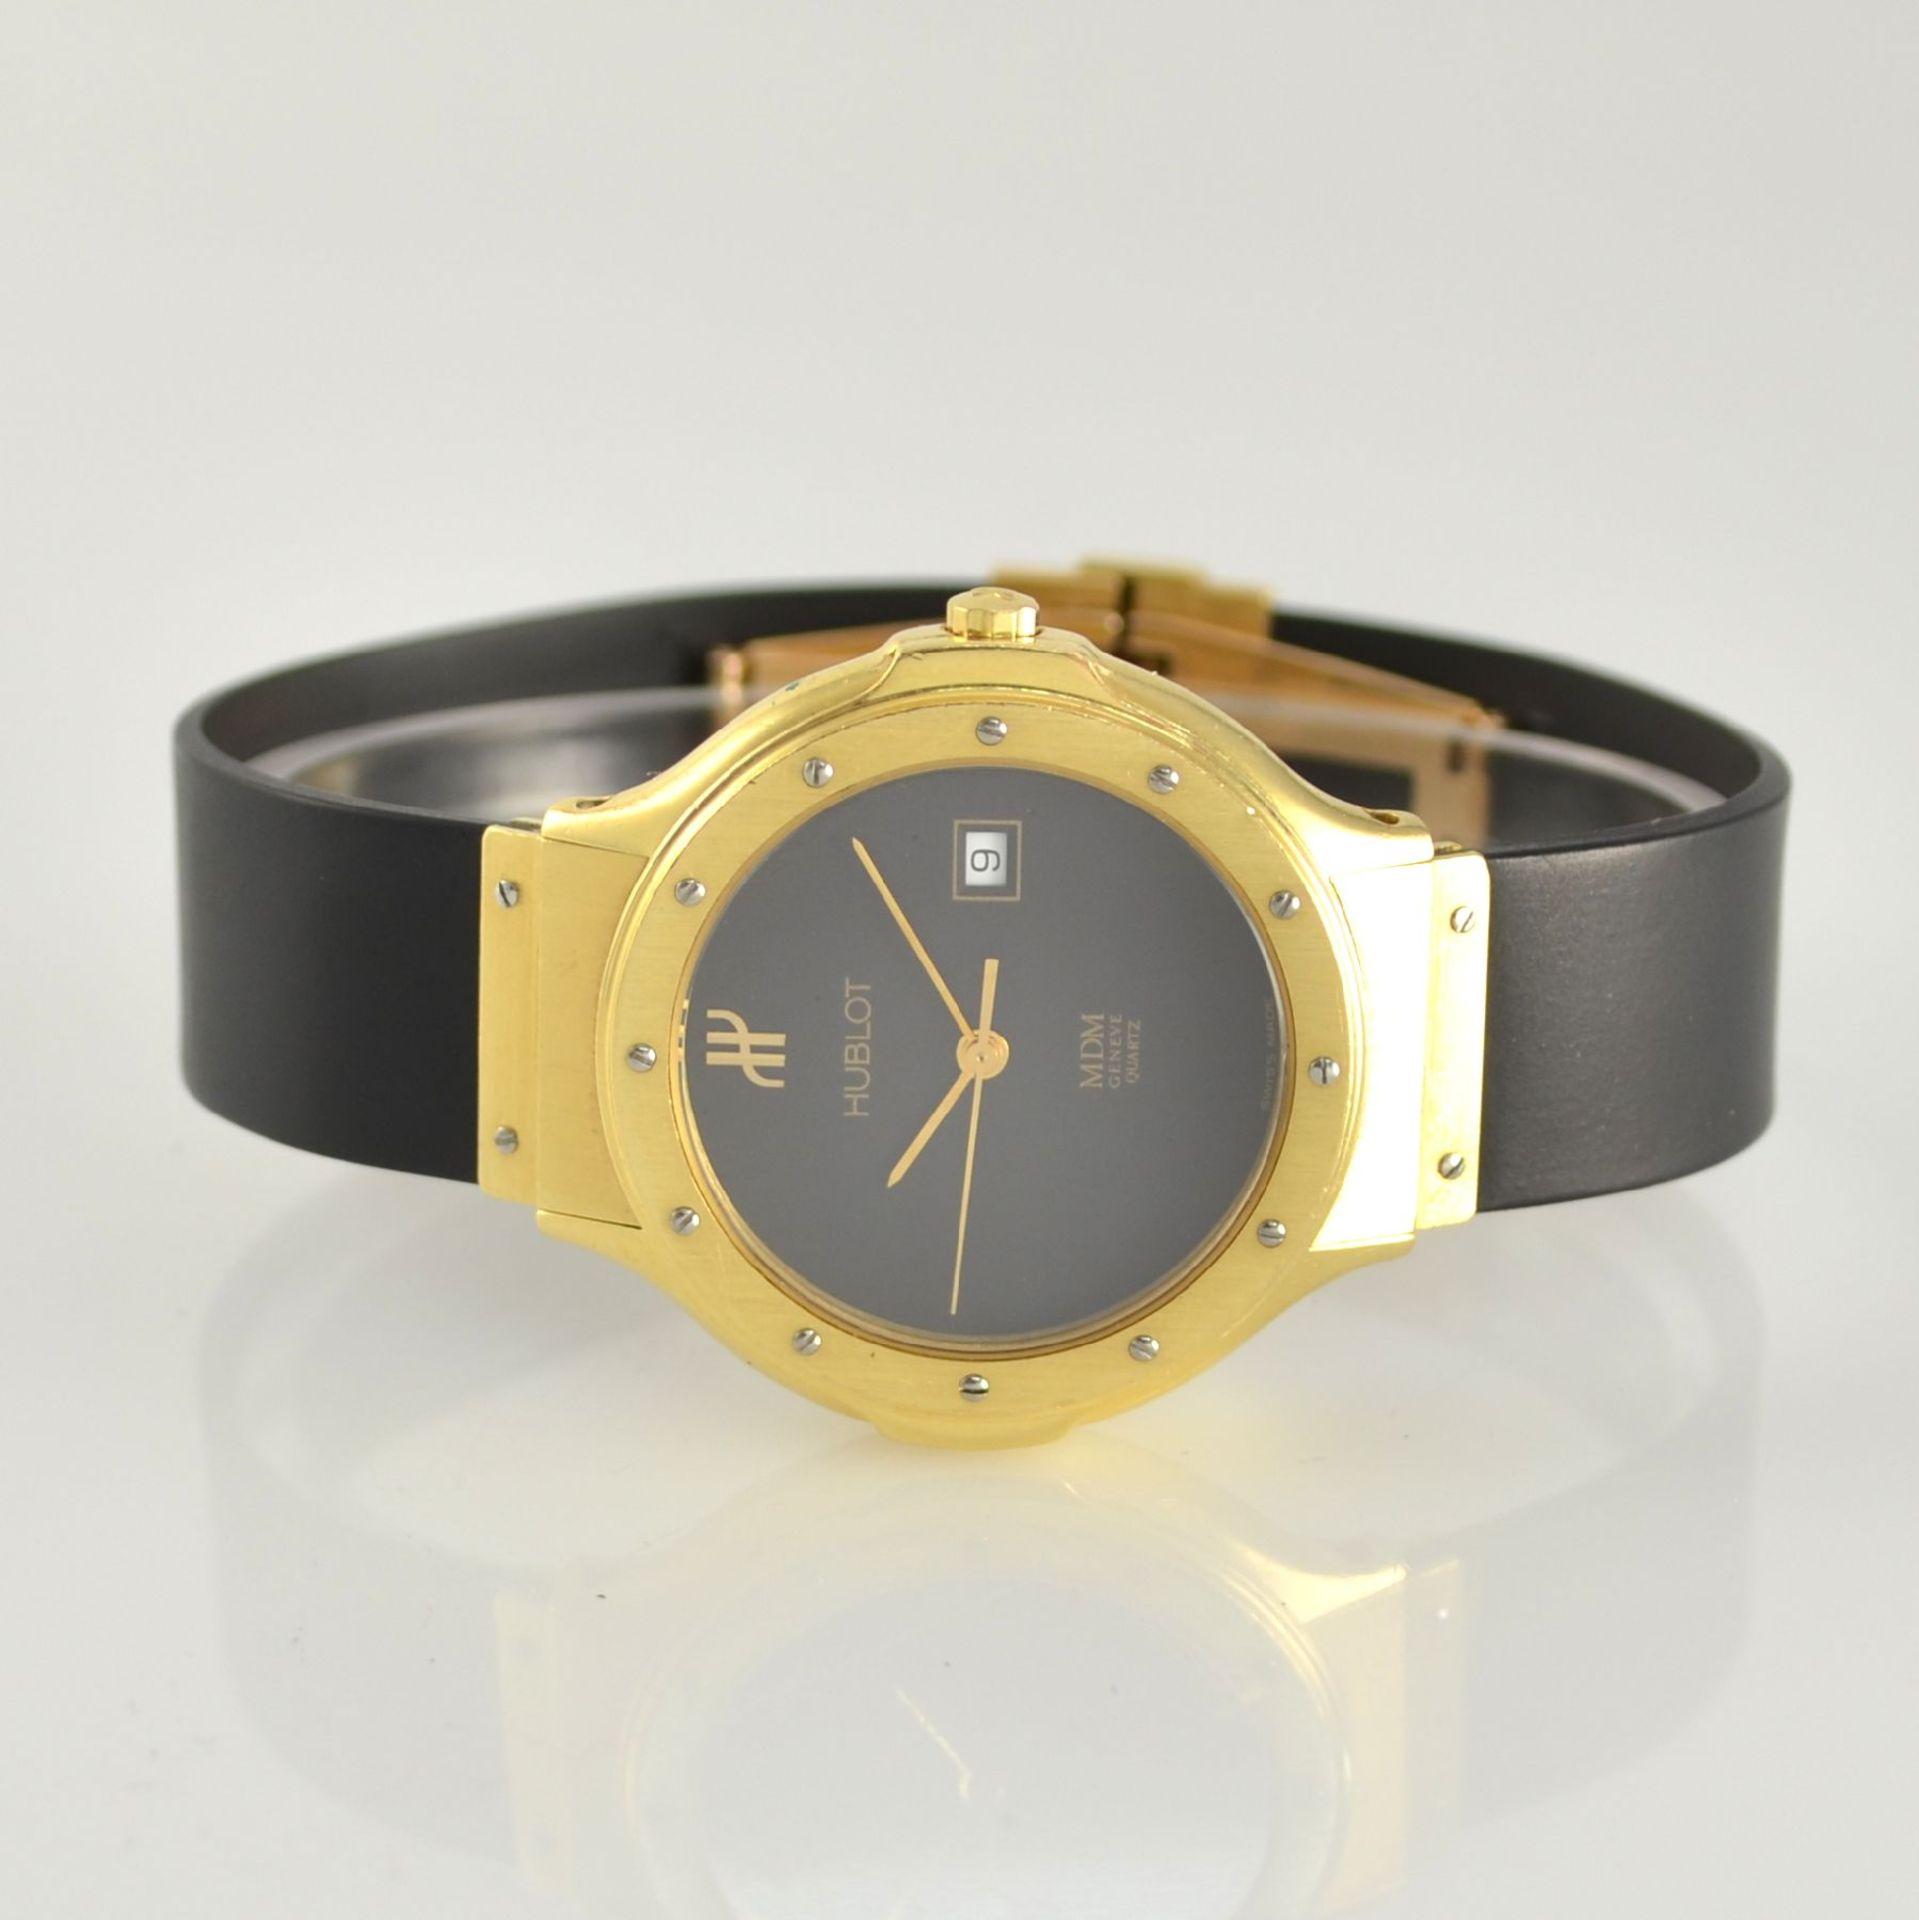 HUBLOT MDM Armbanduhr in GG 750/000, Schweiz um 1995, quarz, Ref. 140.10.3, massives Goldgeh., Boden